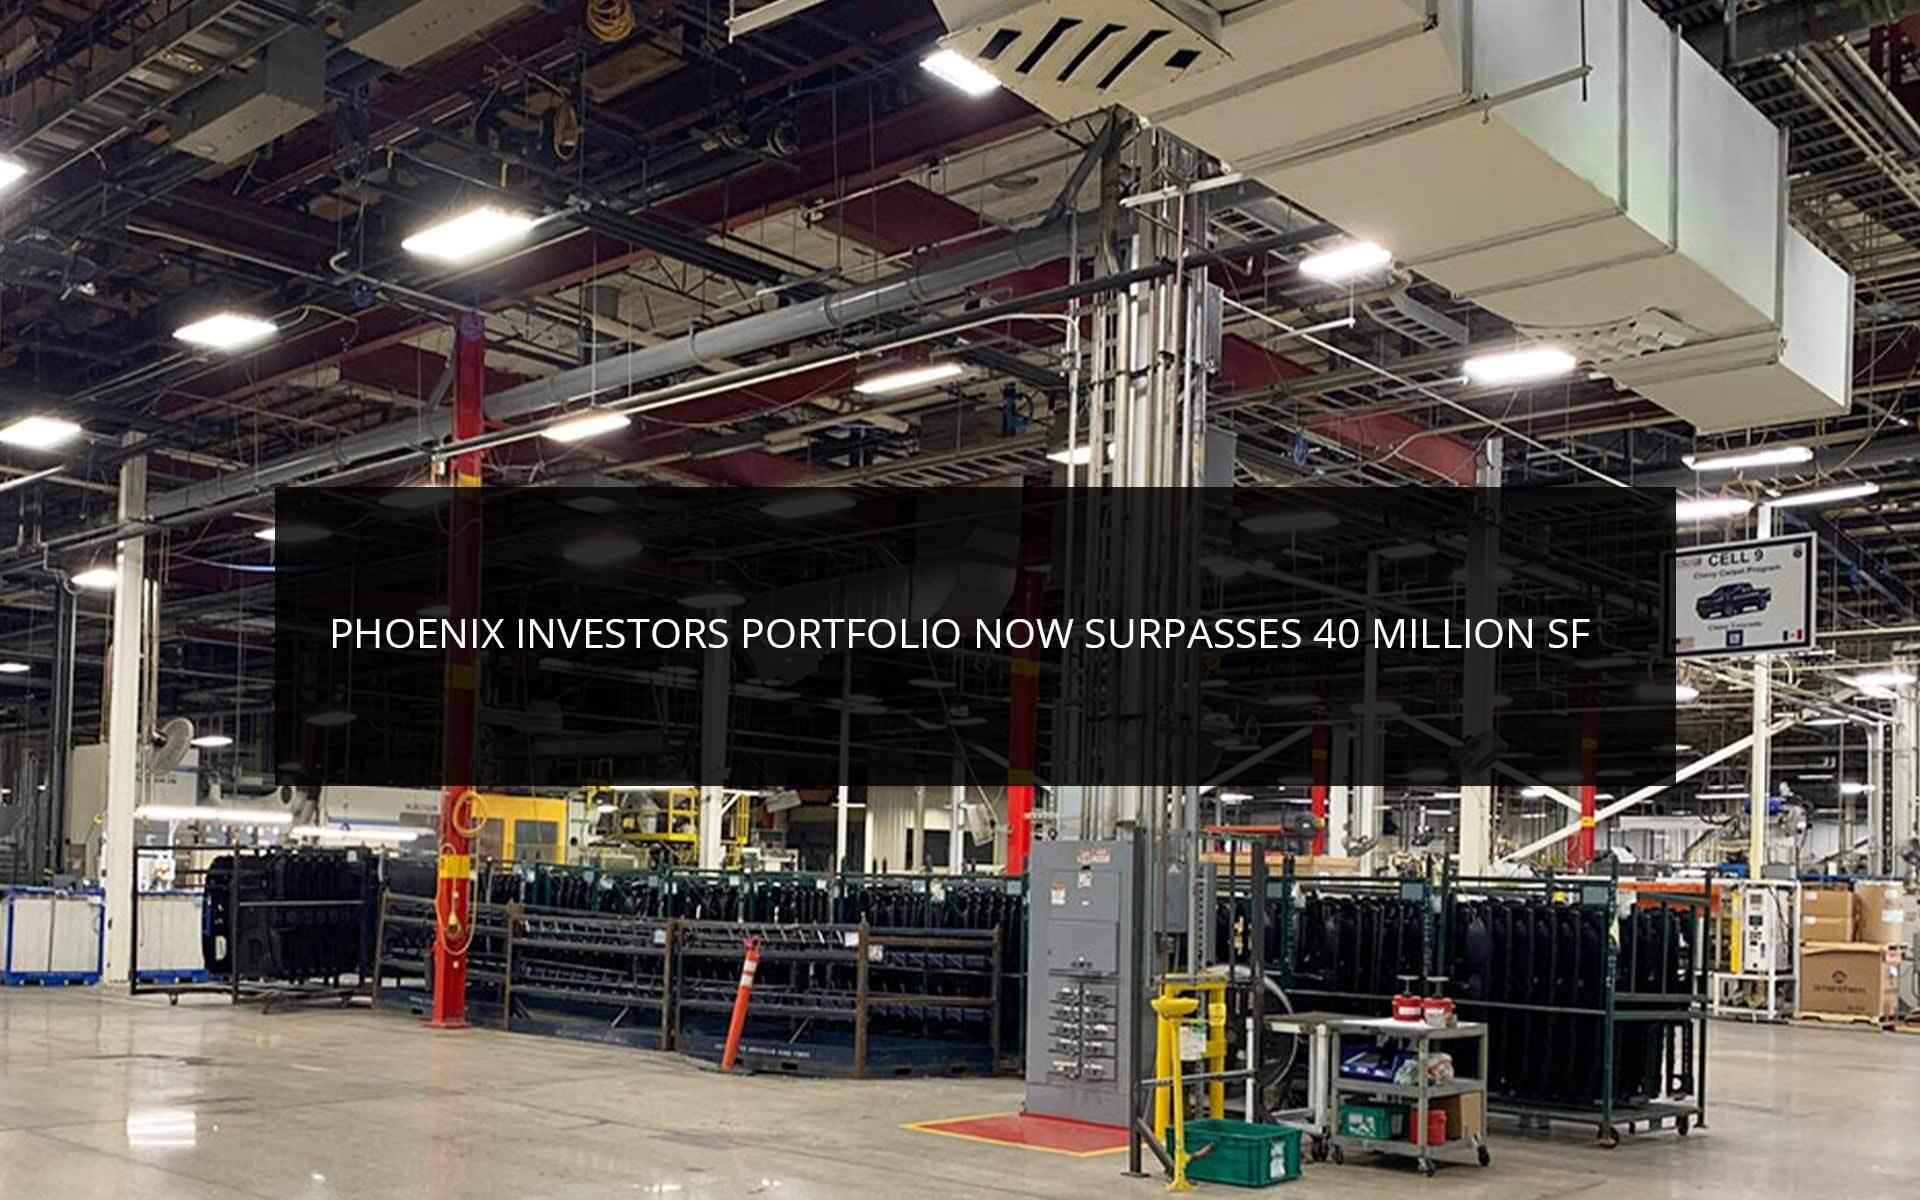 Phoenix Investors Portfolio Now Surpasses 40 Million SF